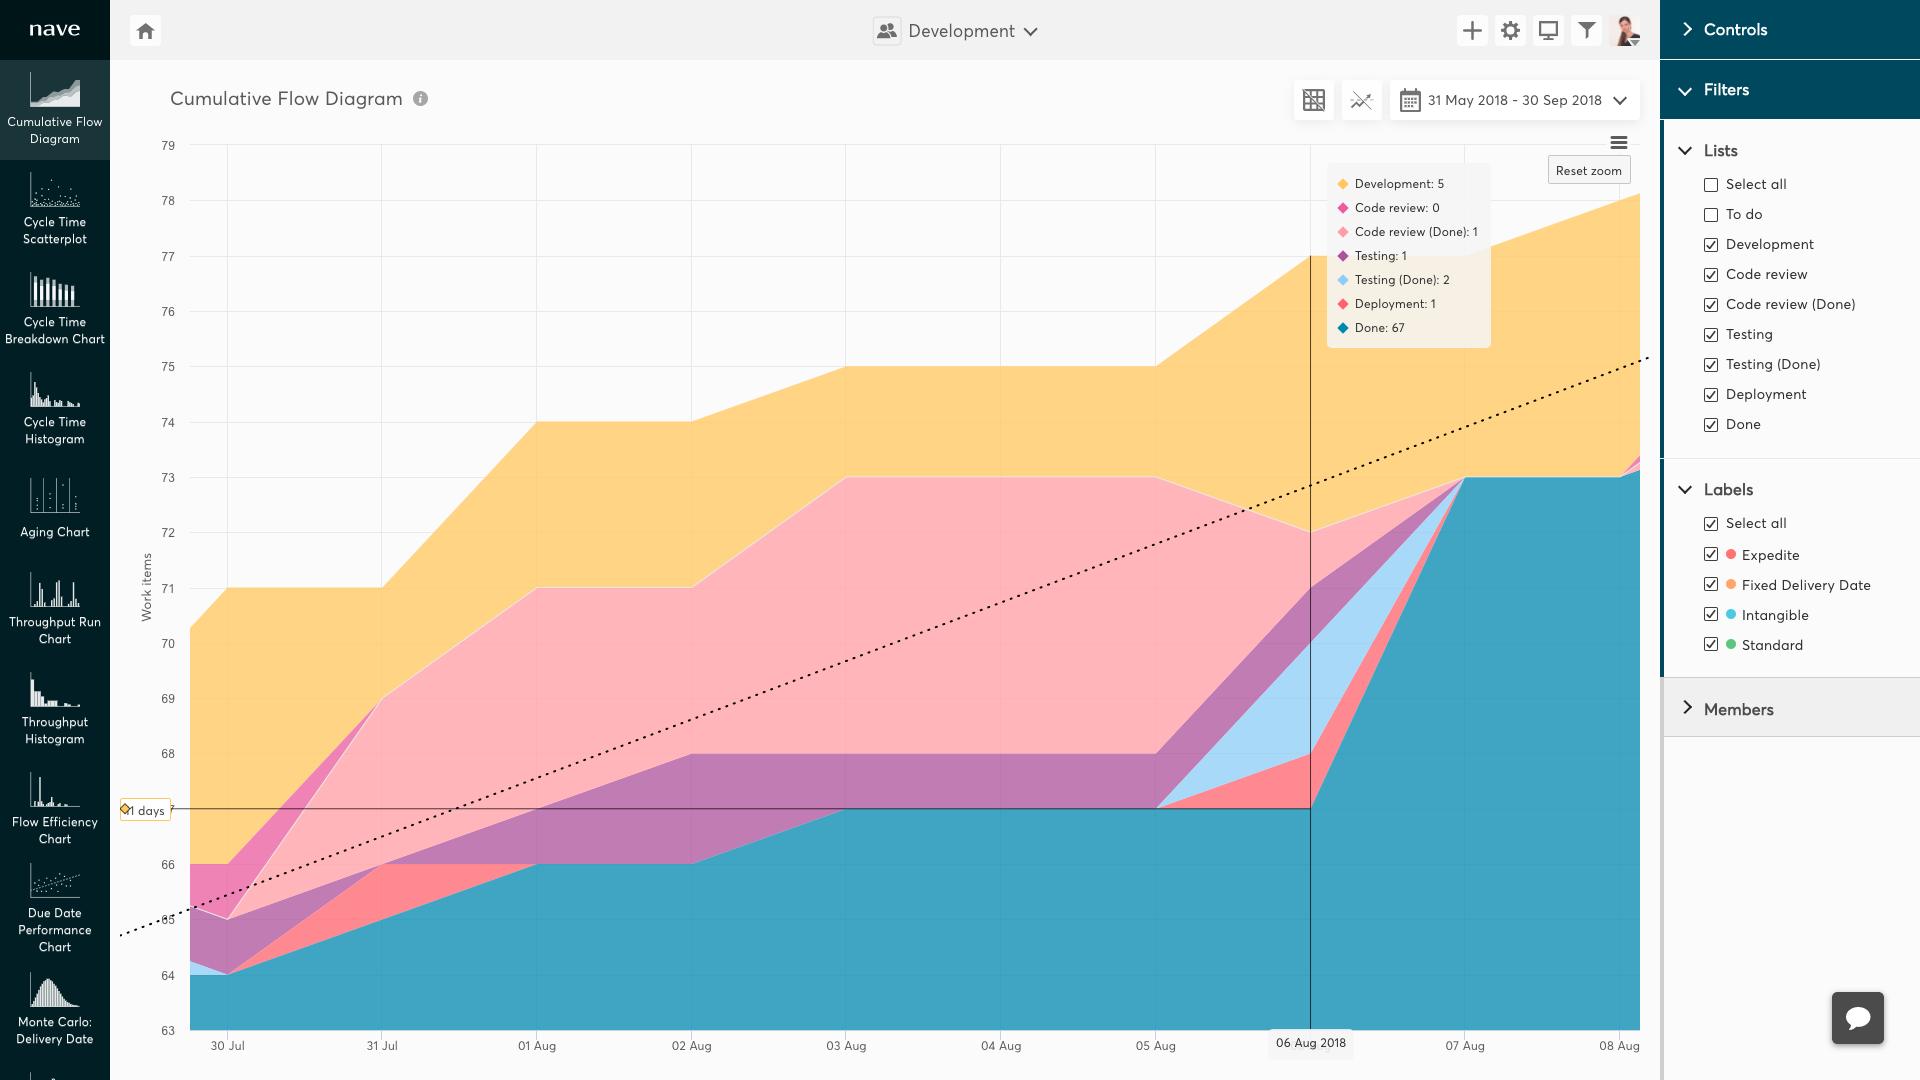 Cumulative Flow Diagram with decreasing bands